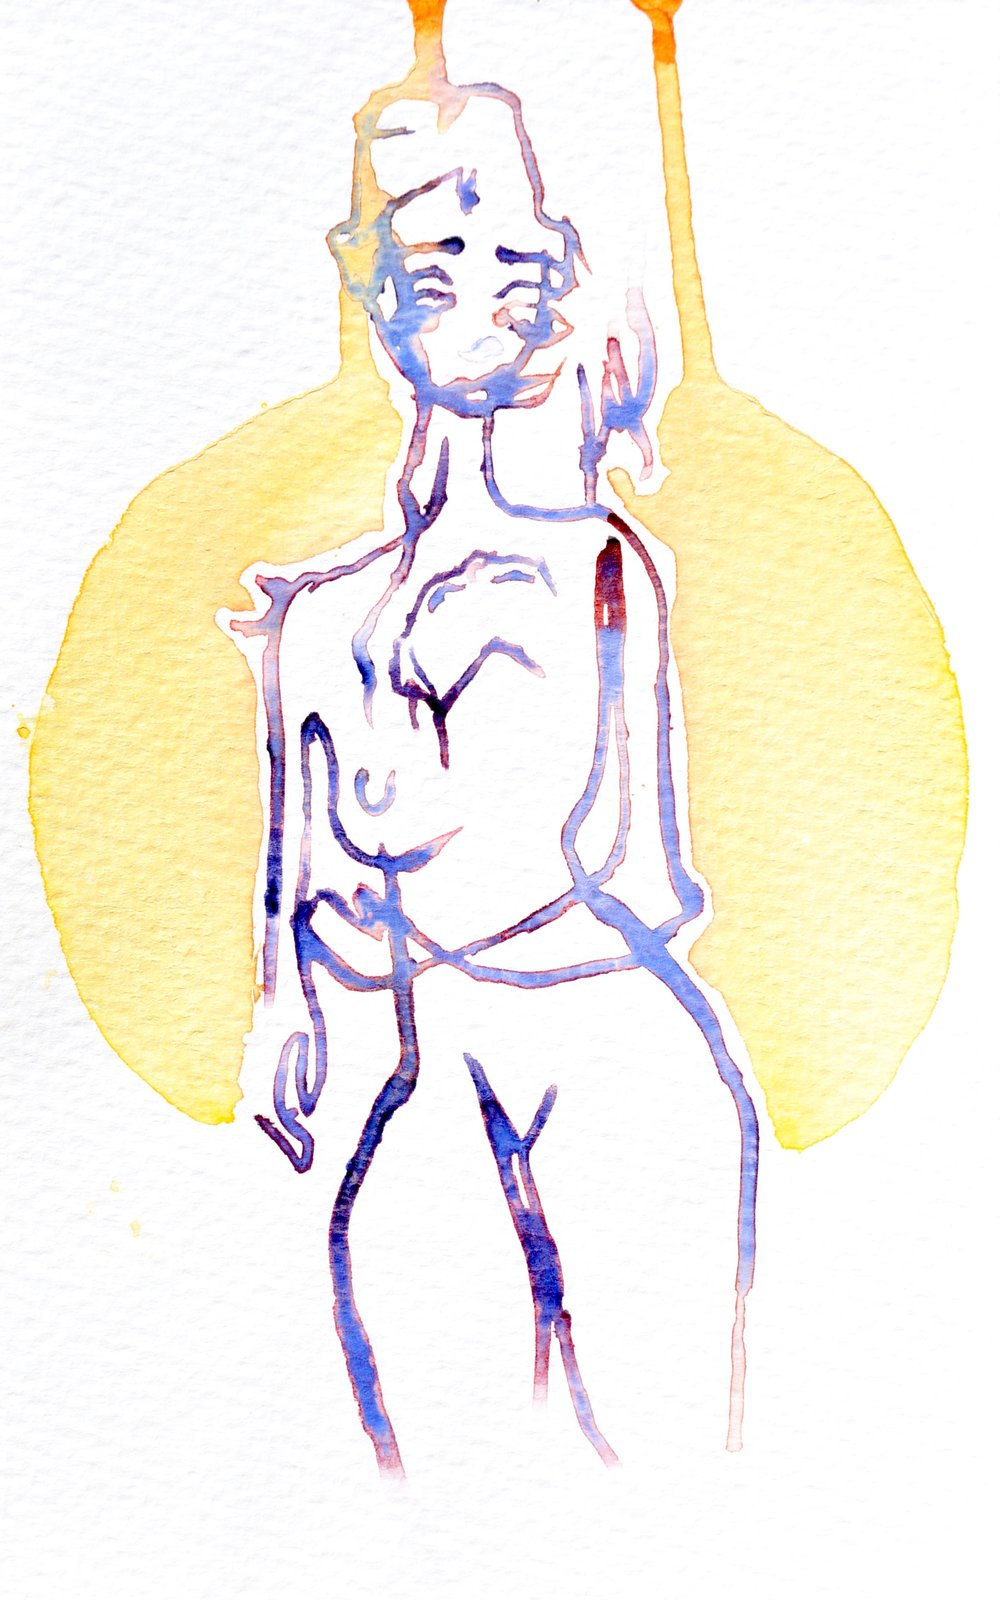 drip , 2016. Watercolor. 8 x 5 in.